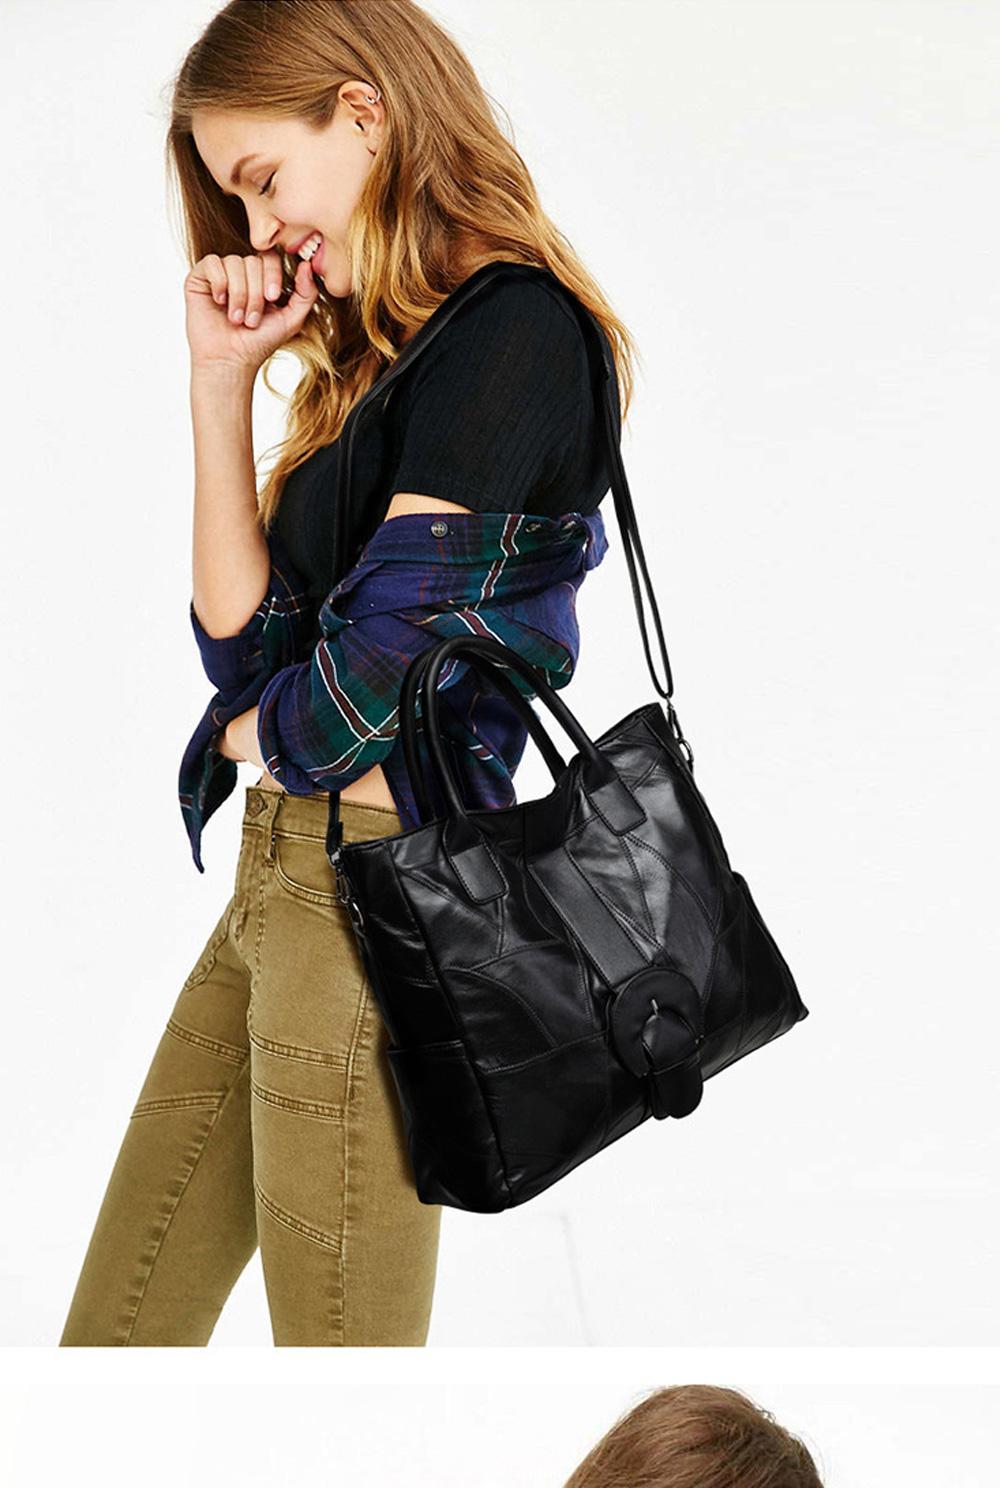 Genuine Leather Handbags Sheepskin Tote Bags, New Large-capacity Shoulder Handbags, Mommy bags Designed for women 33*10*31cm 0